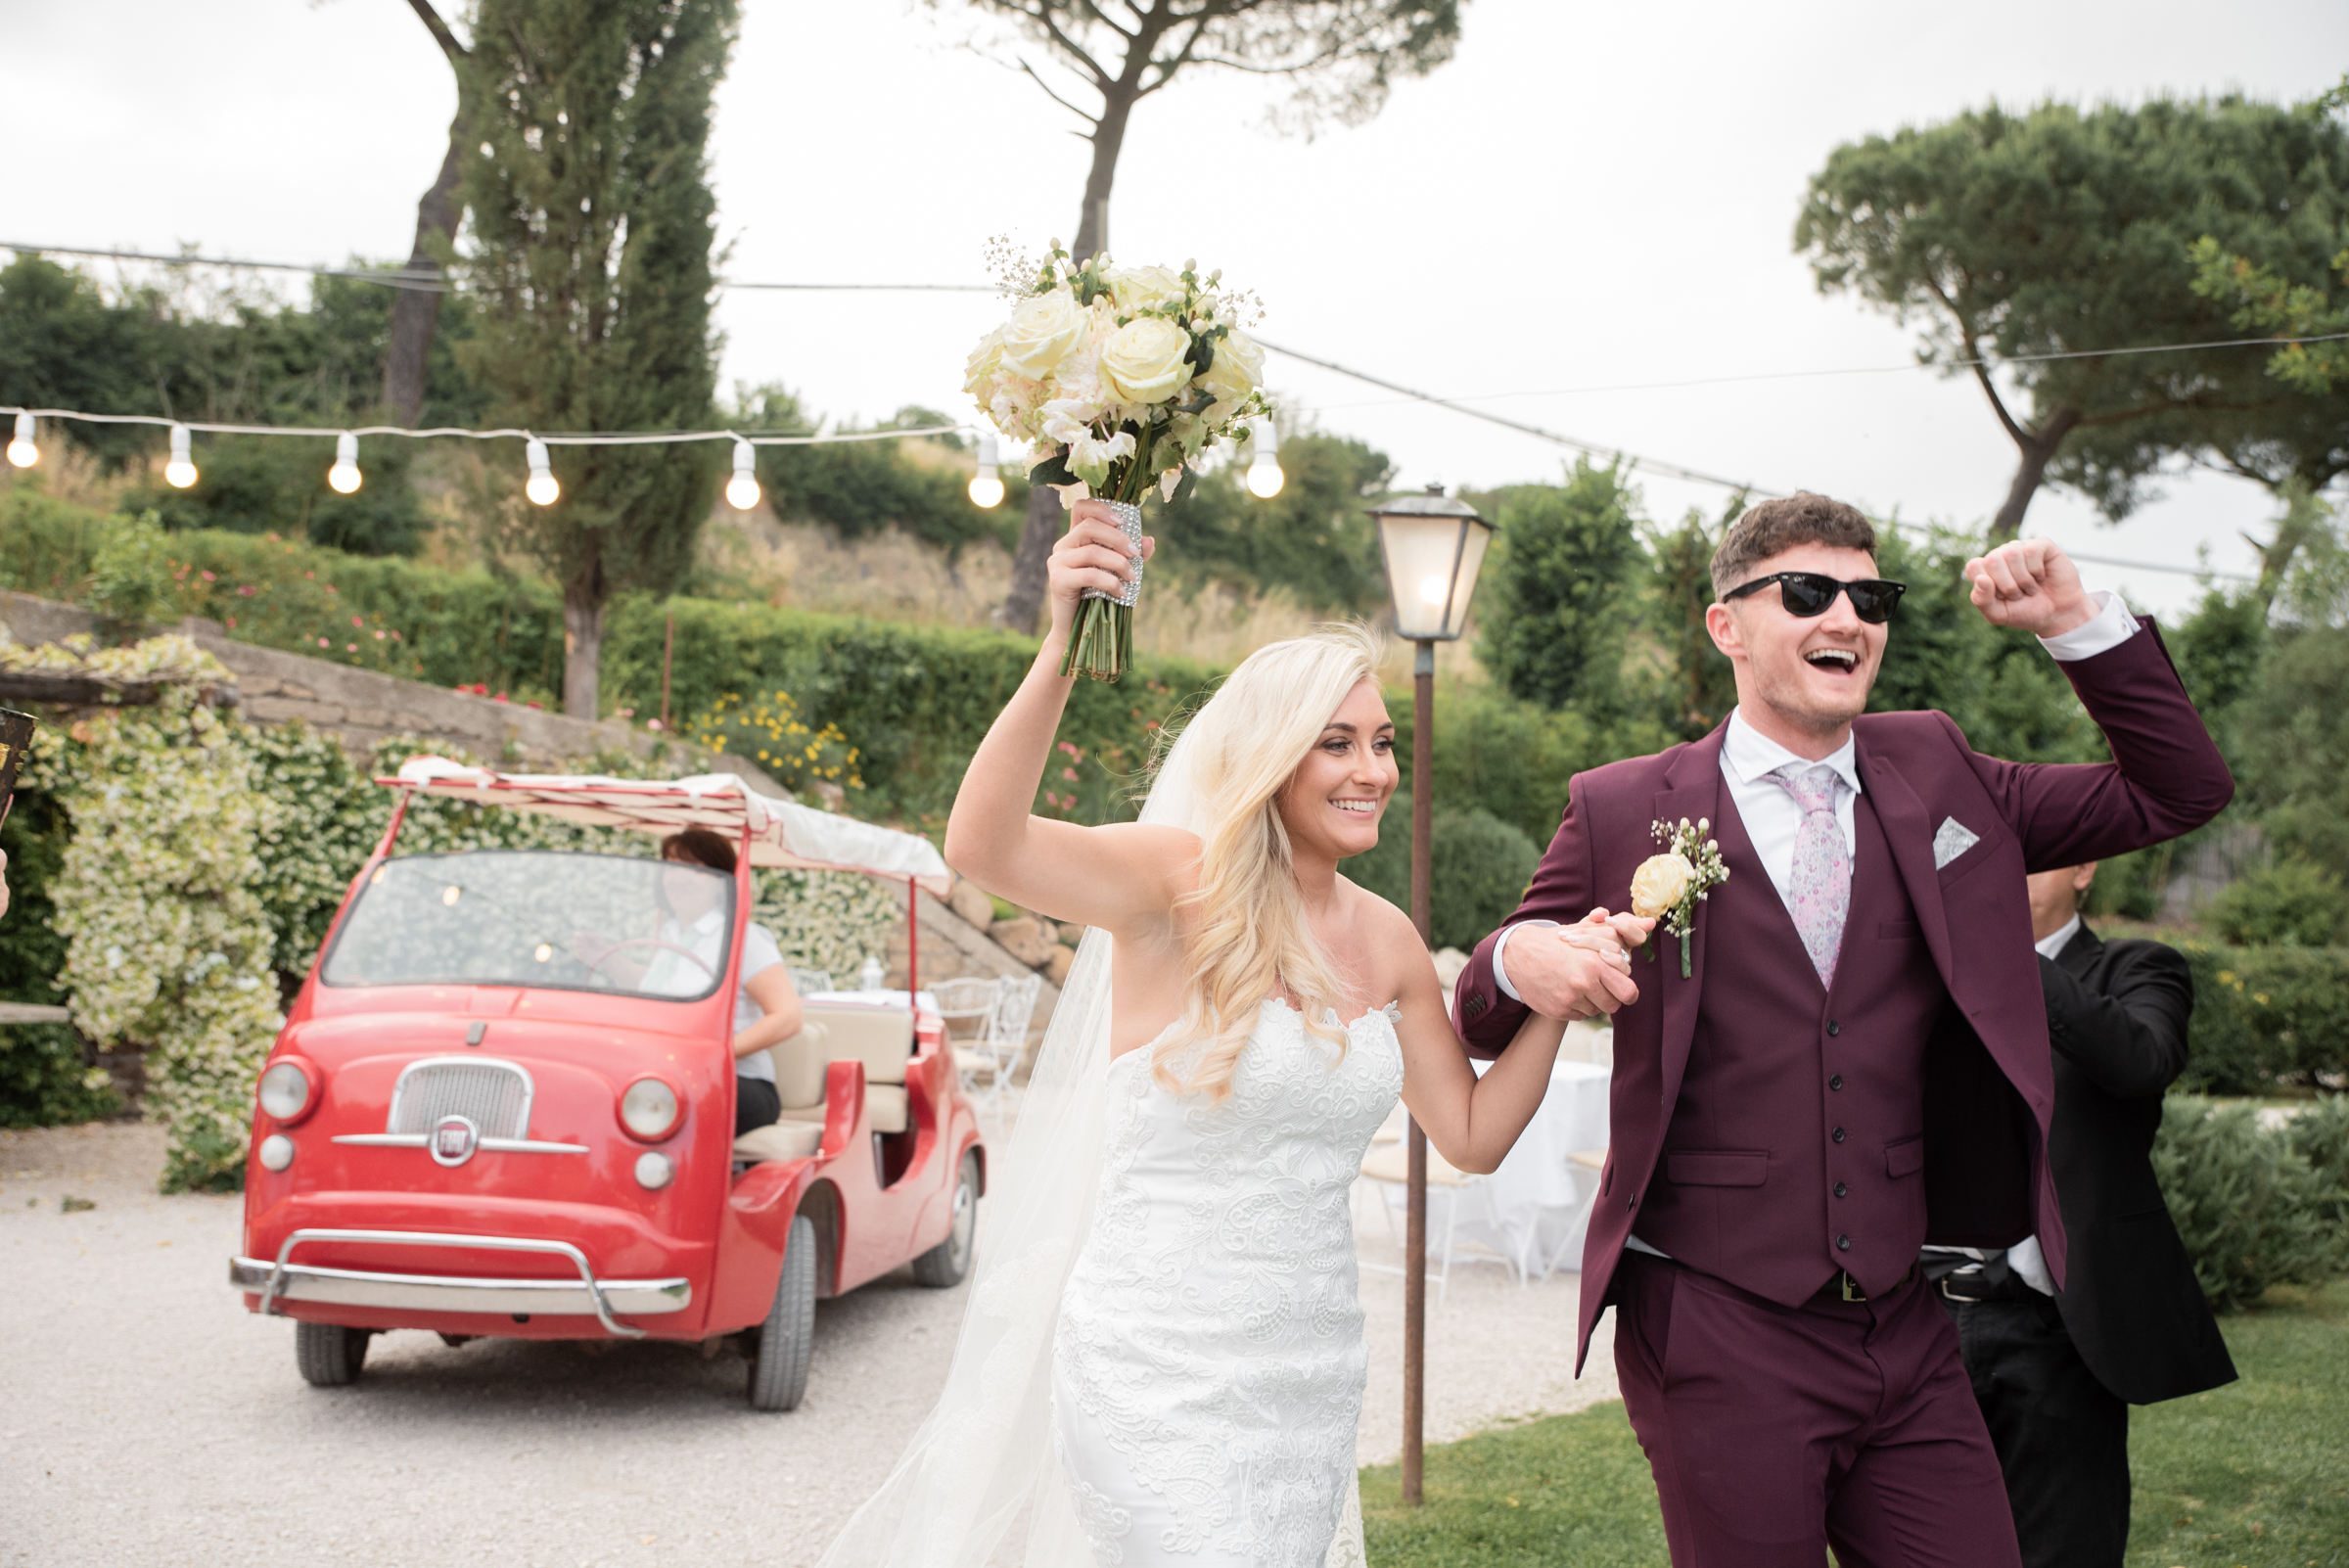 Borgo di tragliata Wedding-33.jpg